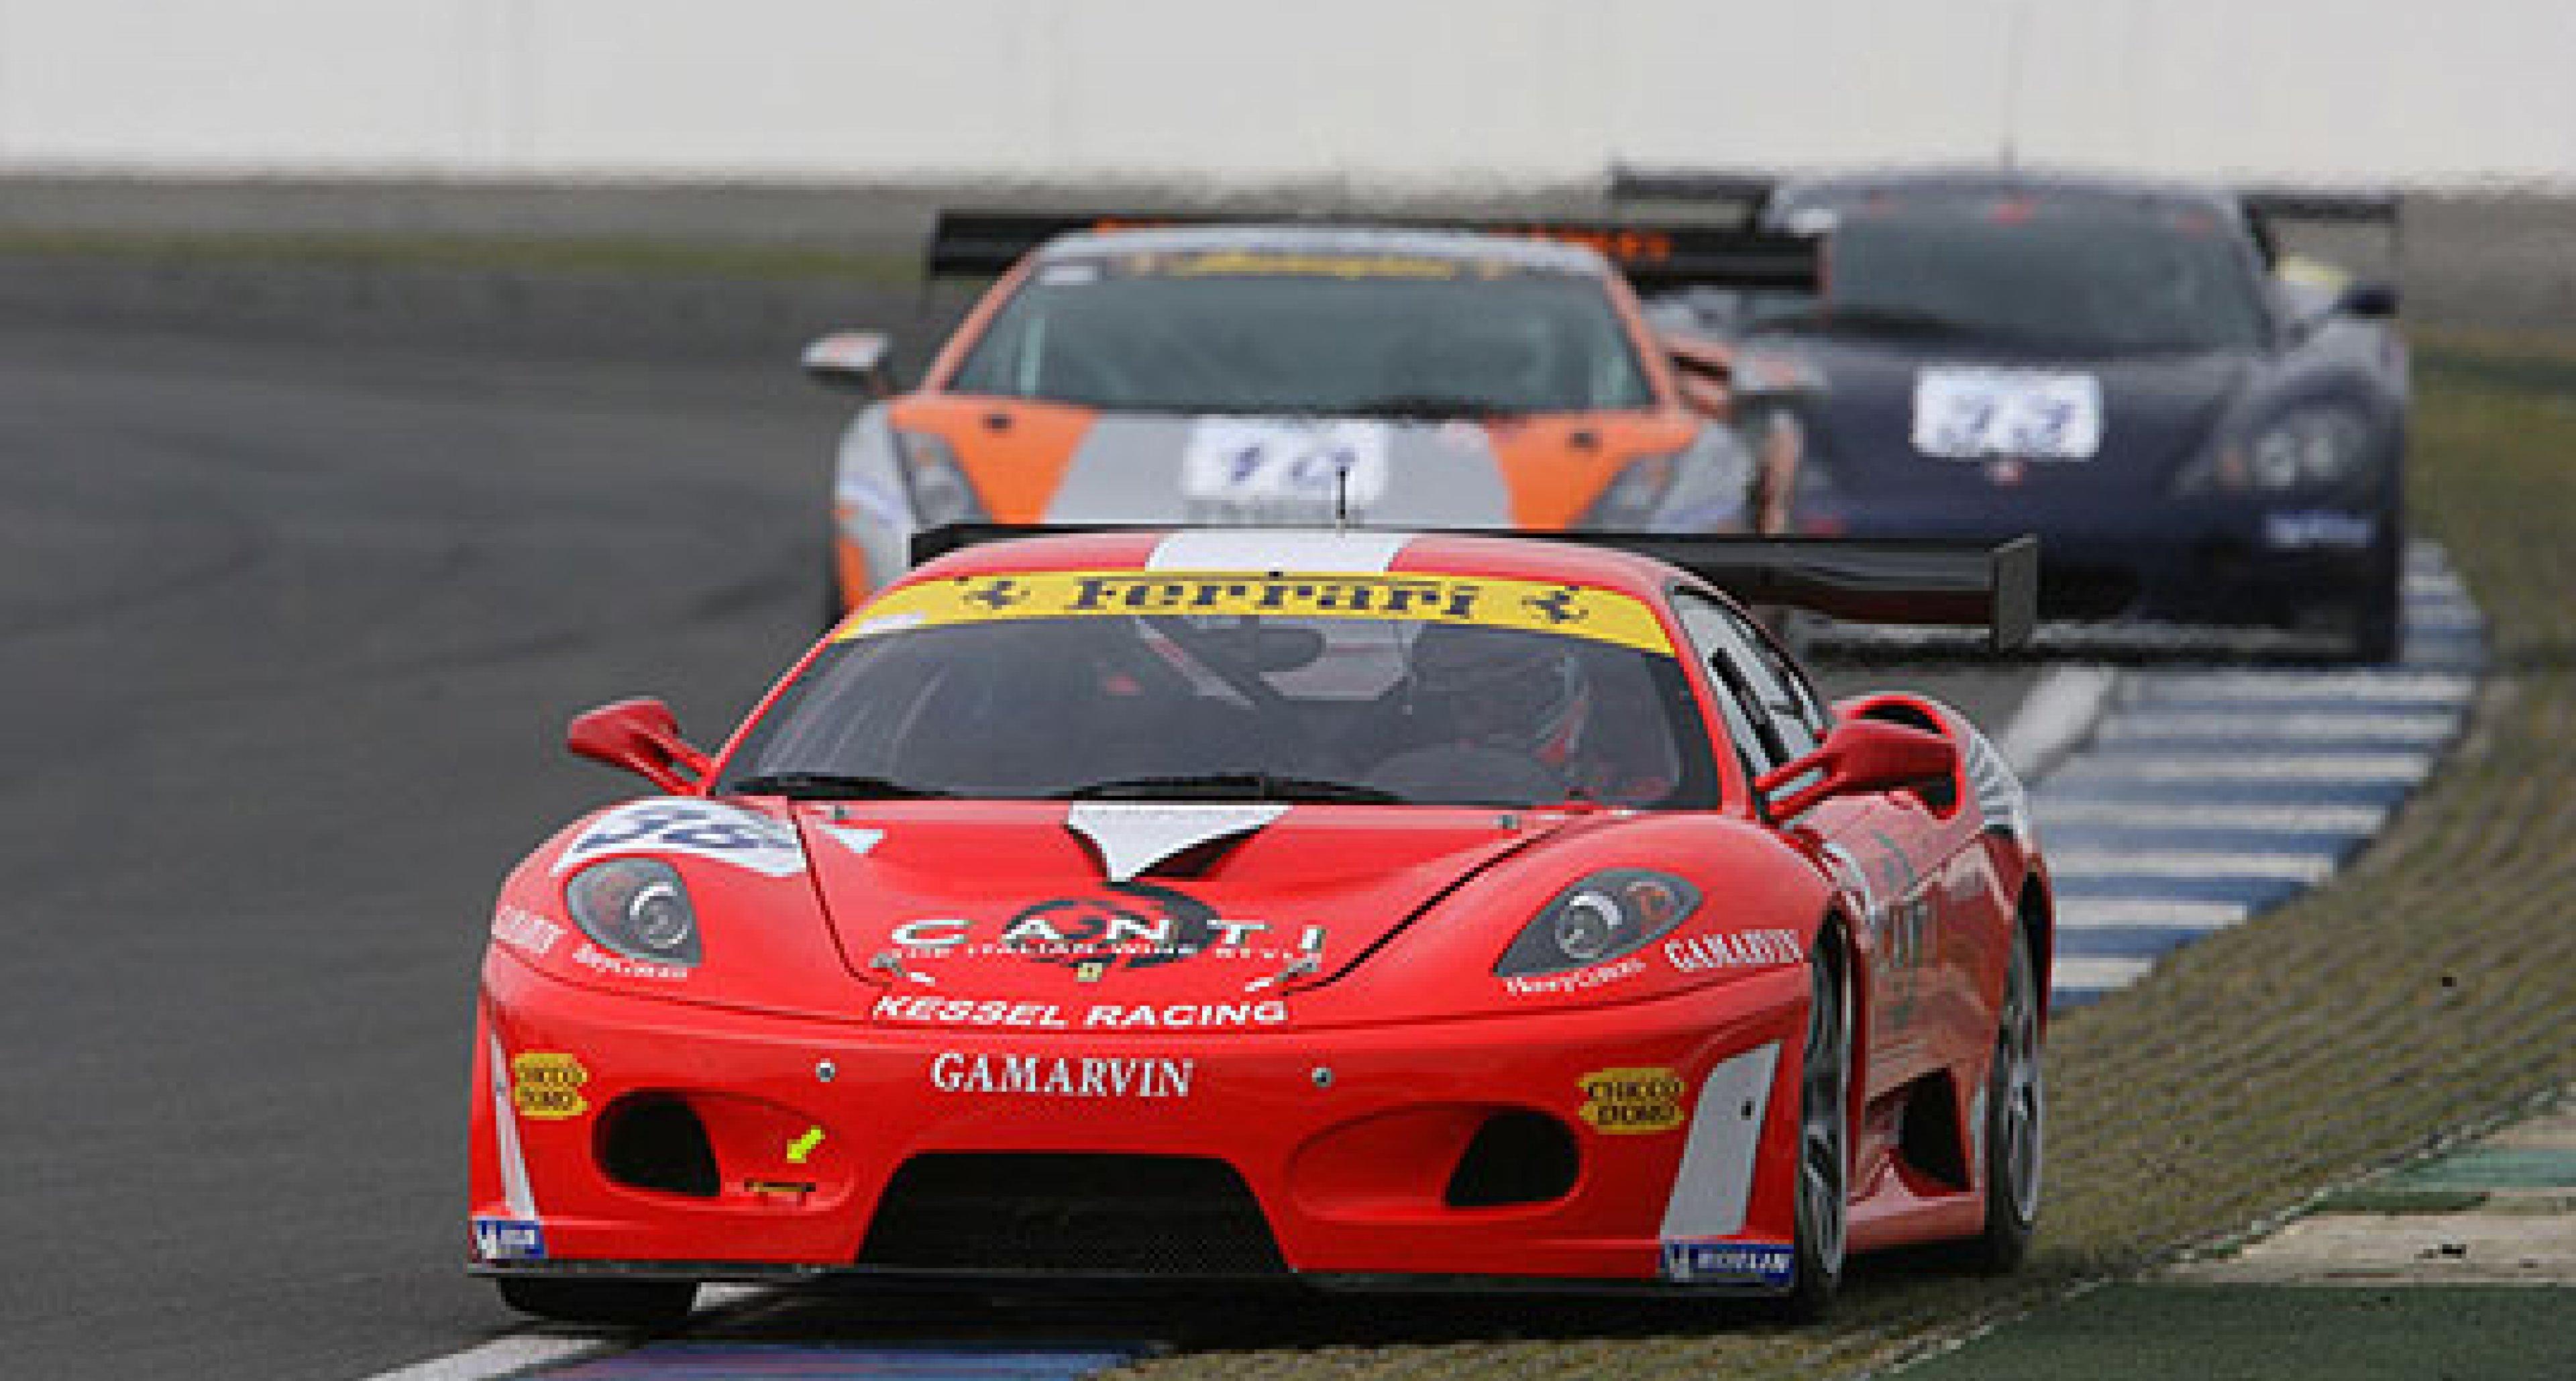 2007 Royal Automobile Club Tourist Trophy - FIA GTs at Silverstone